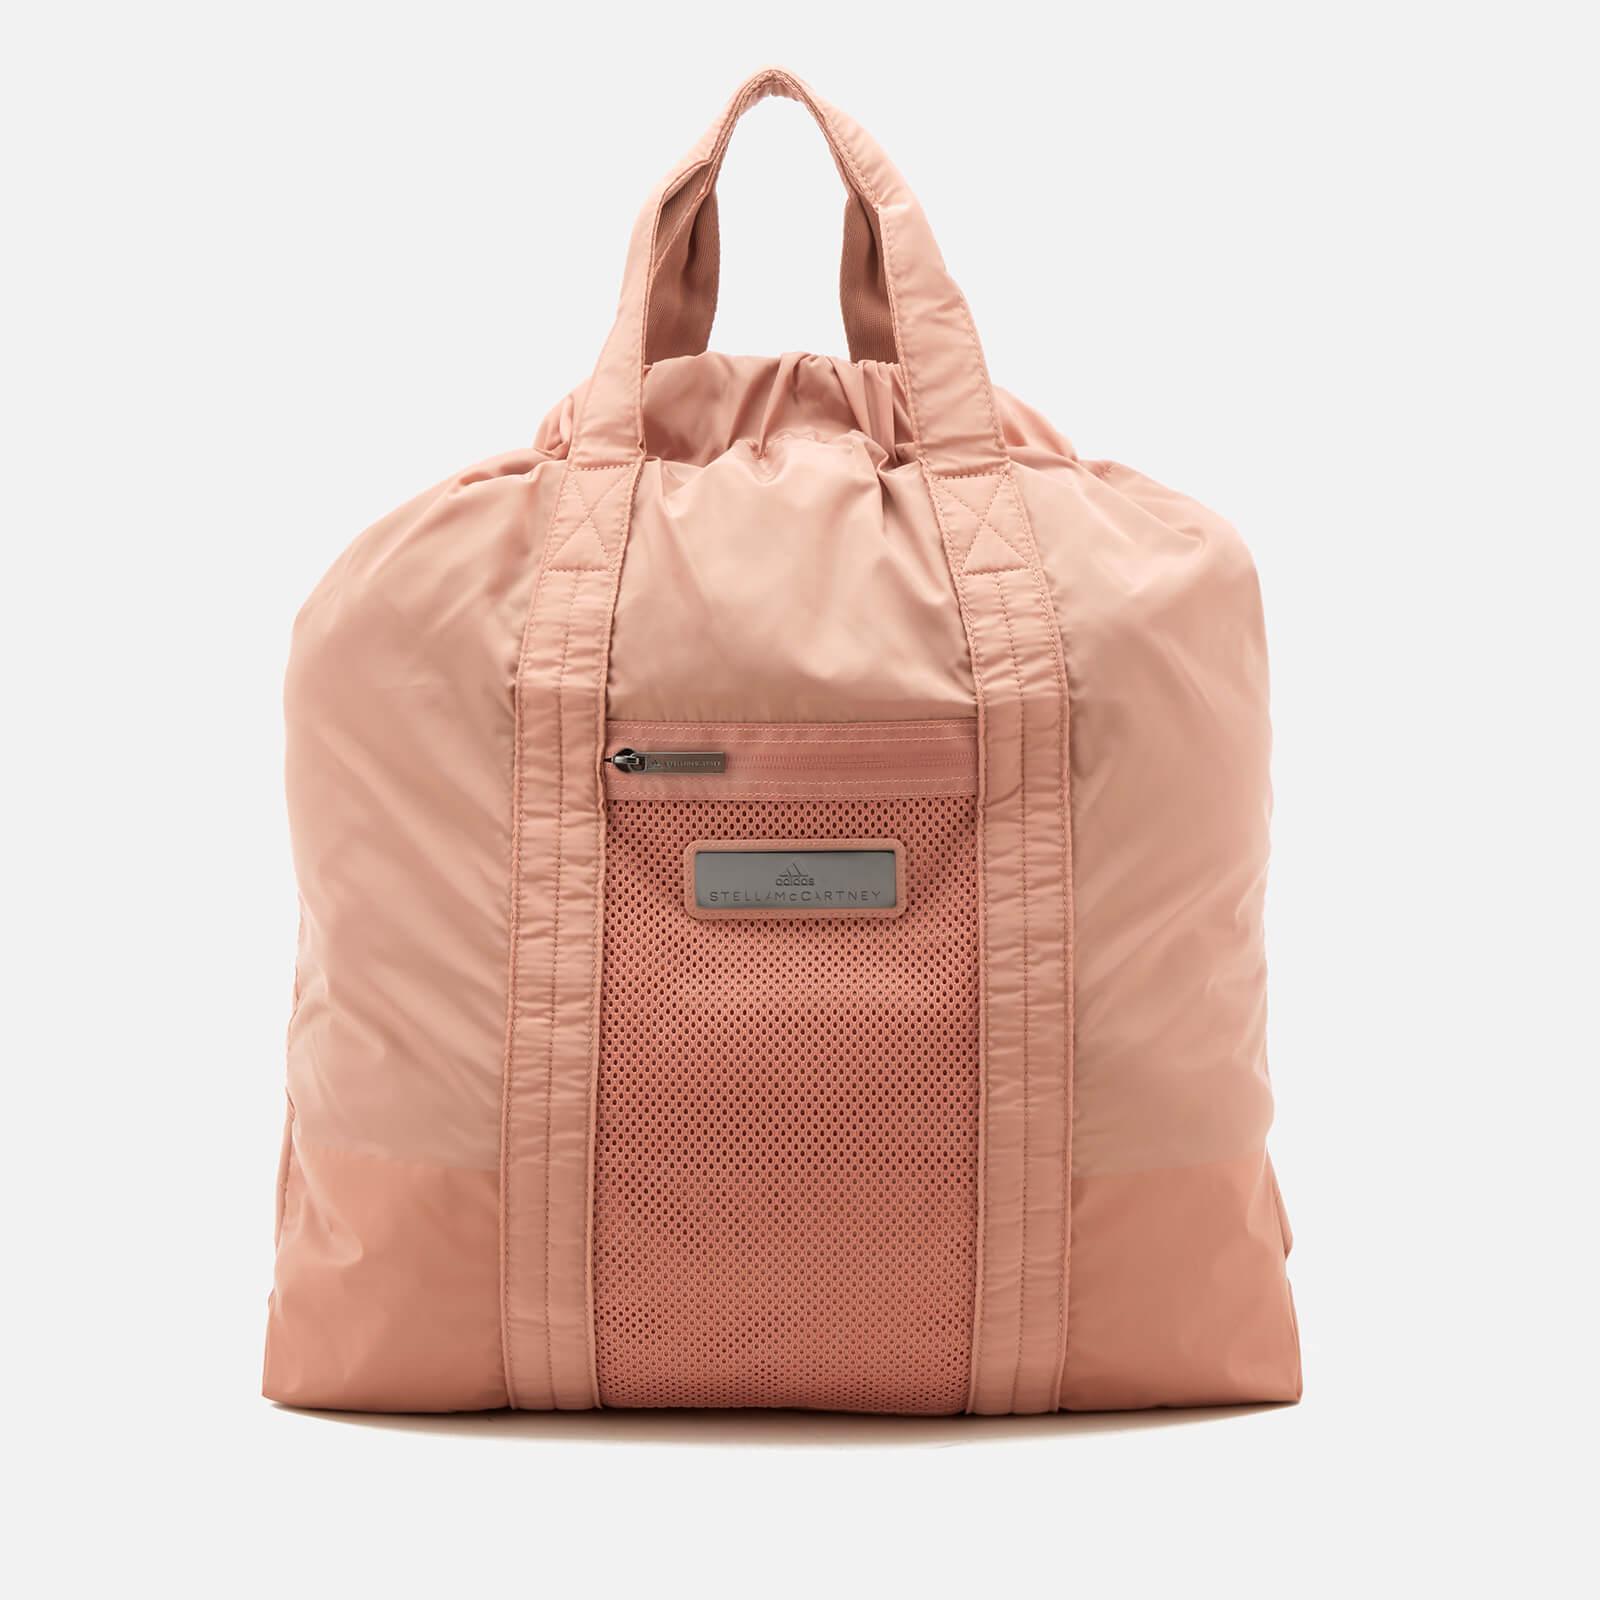 adidas by Stella McCartney Women s Gym Sack Bag - Cinnamon Blush Black Ice  Grey - Free UK Delivery over £50 3d6a7bdf07799